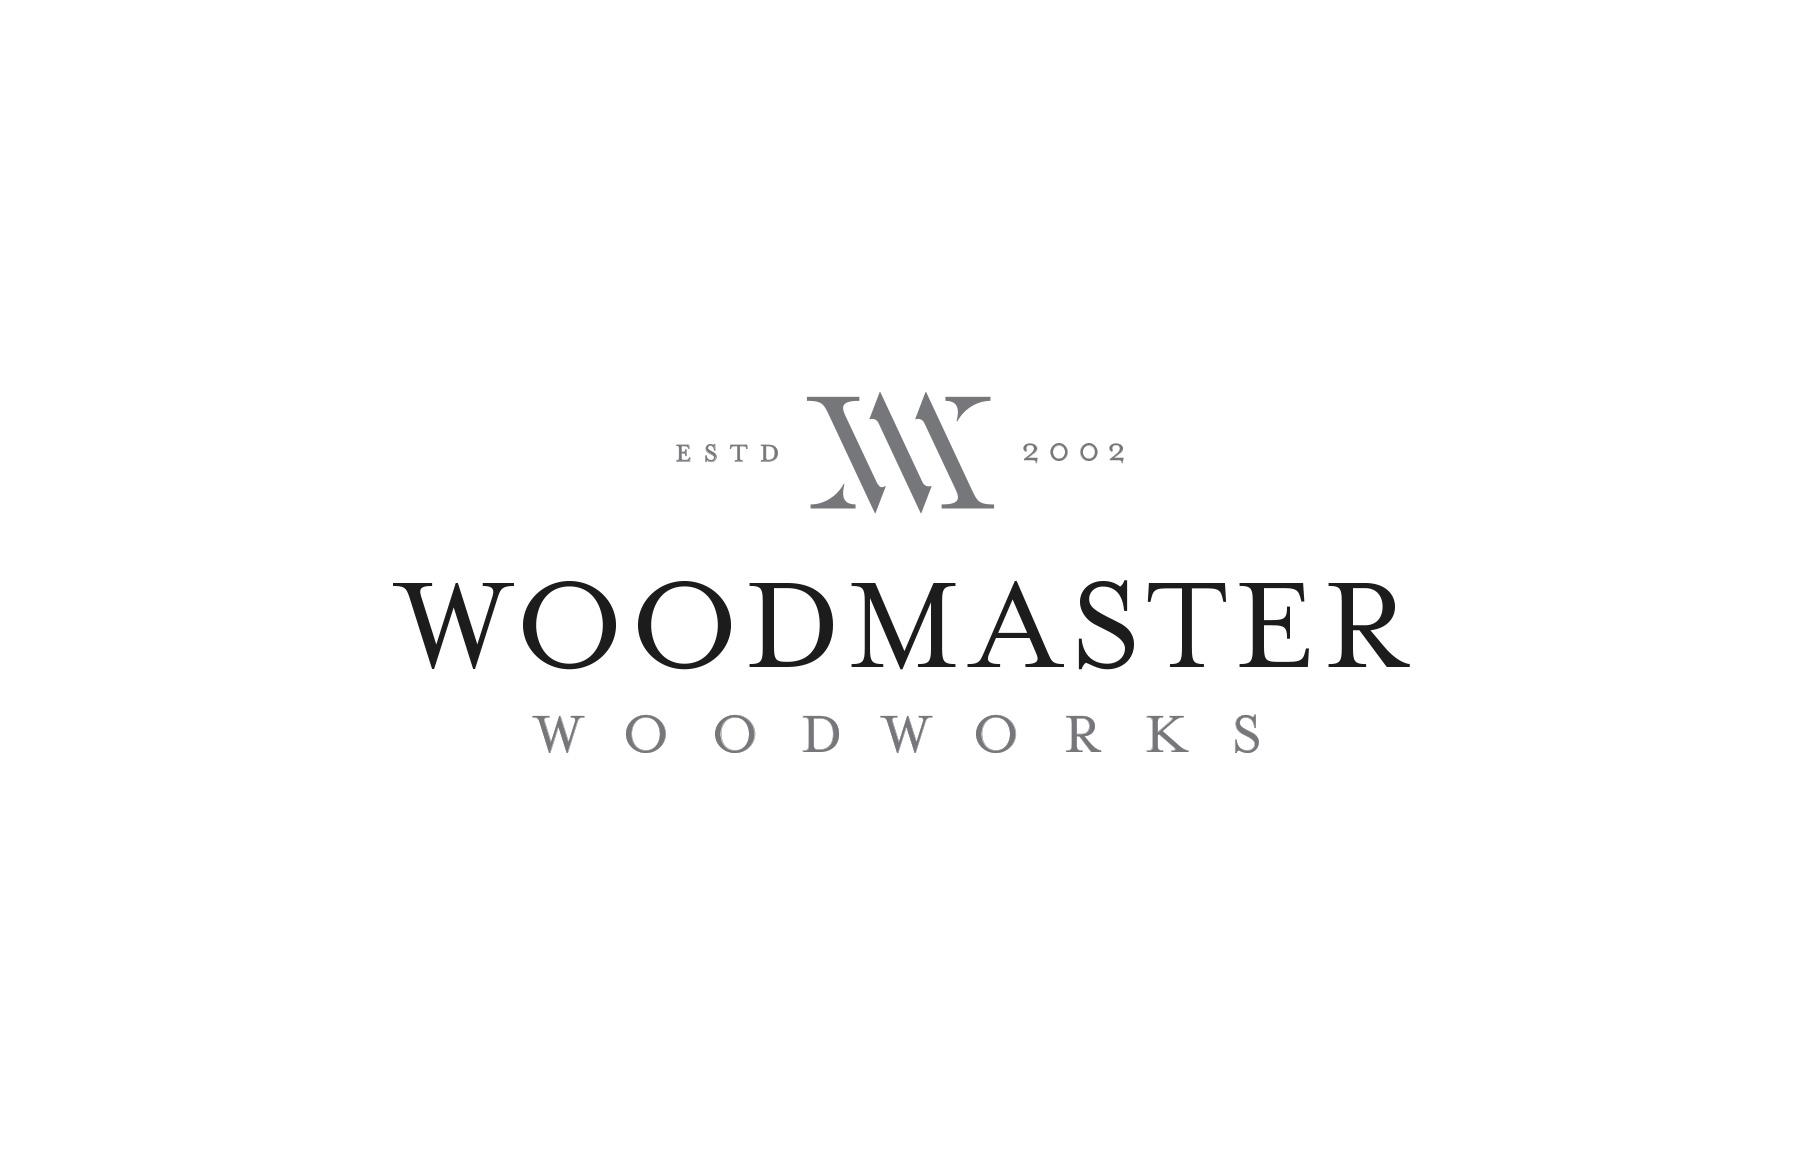 berman_brand_group_joshua_berman_brand_identity_logo_woodmaster_woodworks.jpg